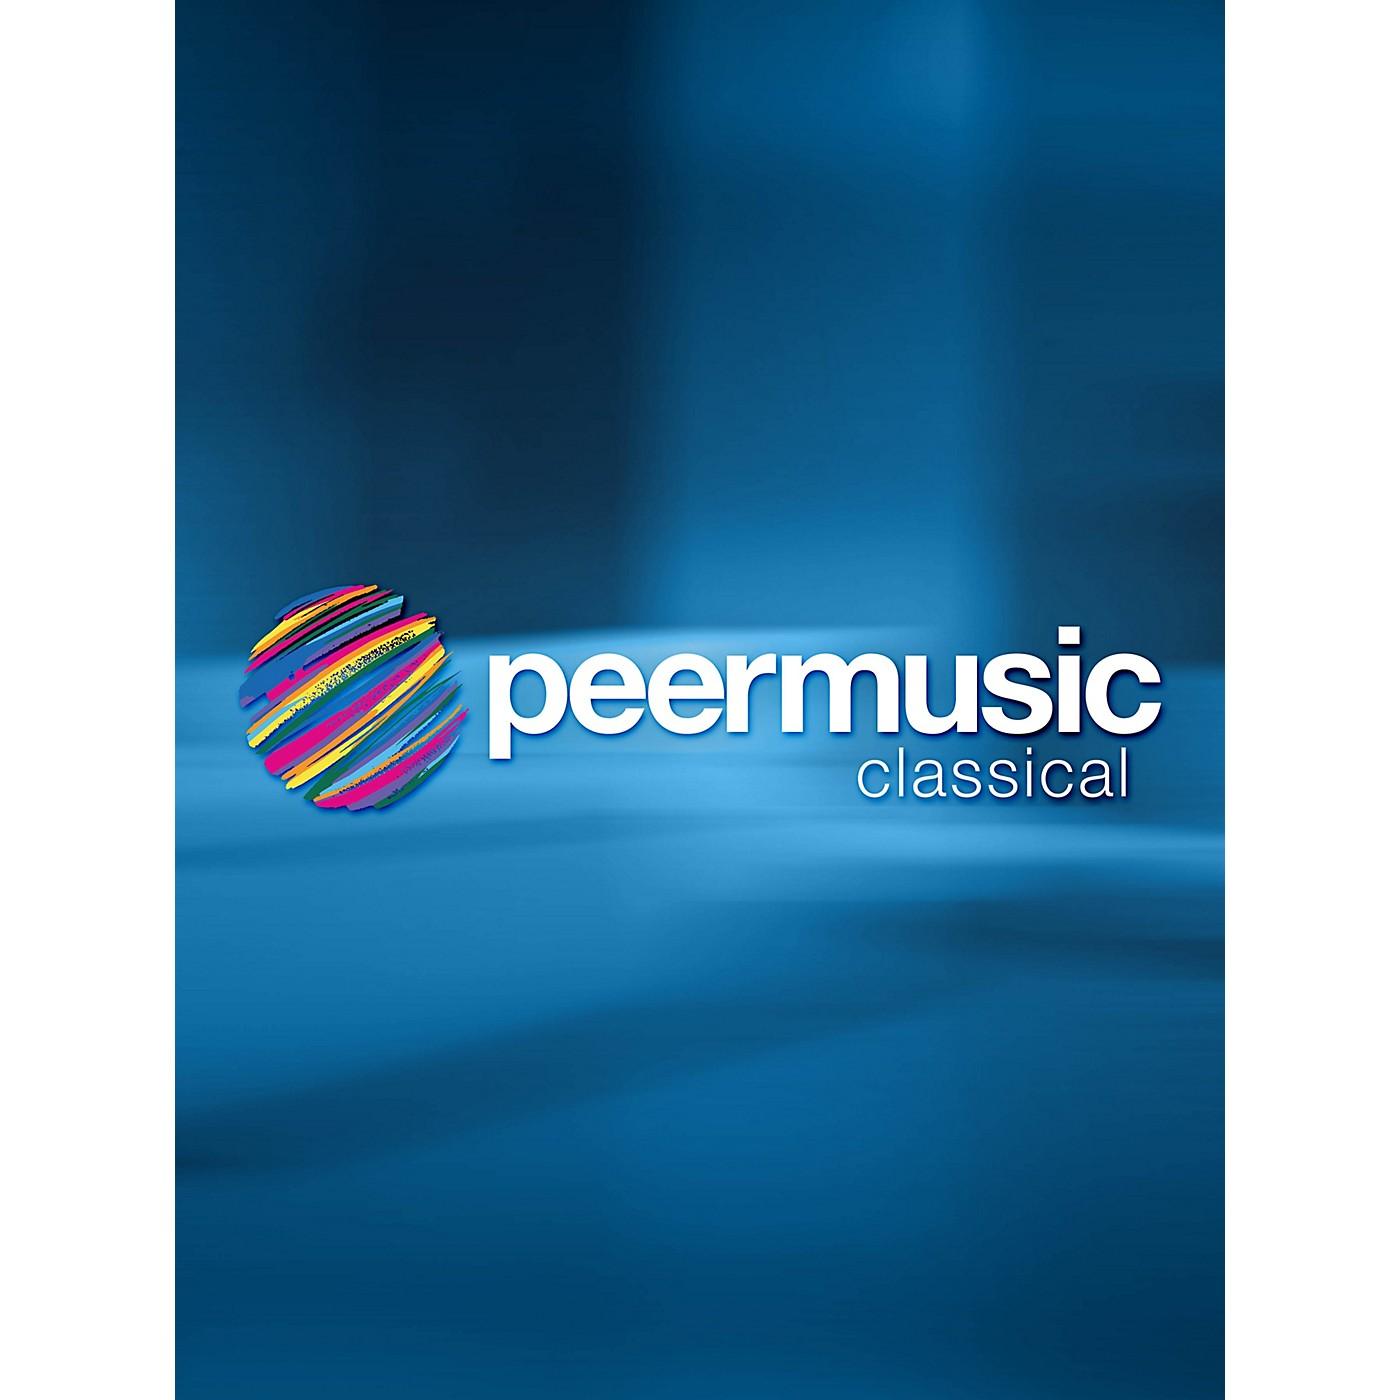 Peer Music 2 Dances (Brass Quintet) Peermusic Classical Series Book  by John Dowland thumbnail